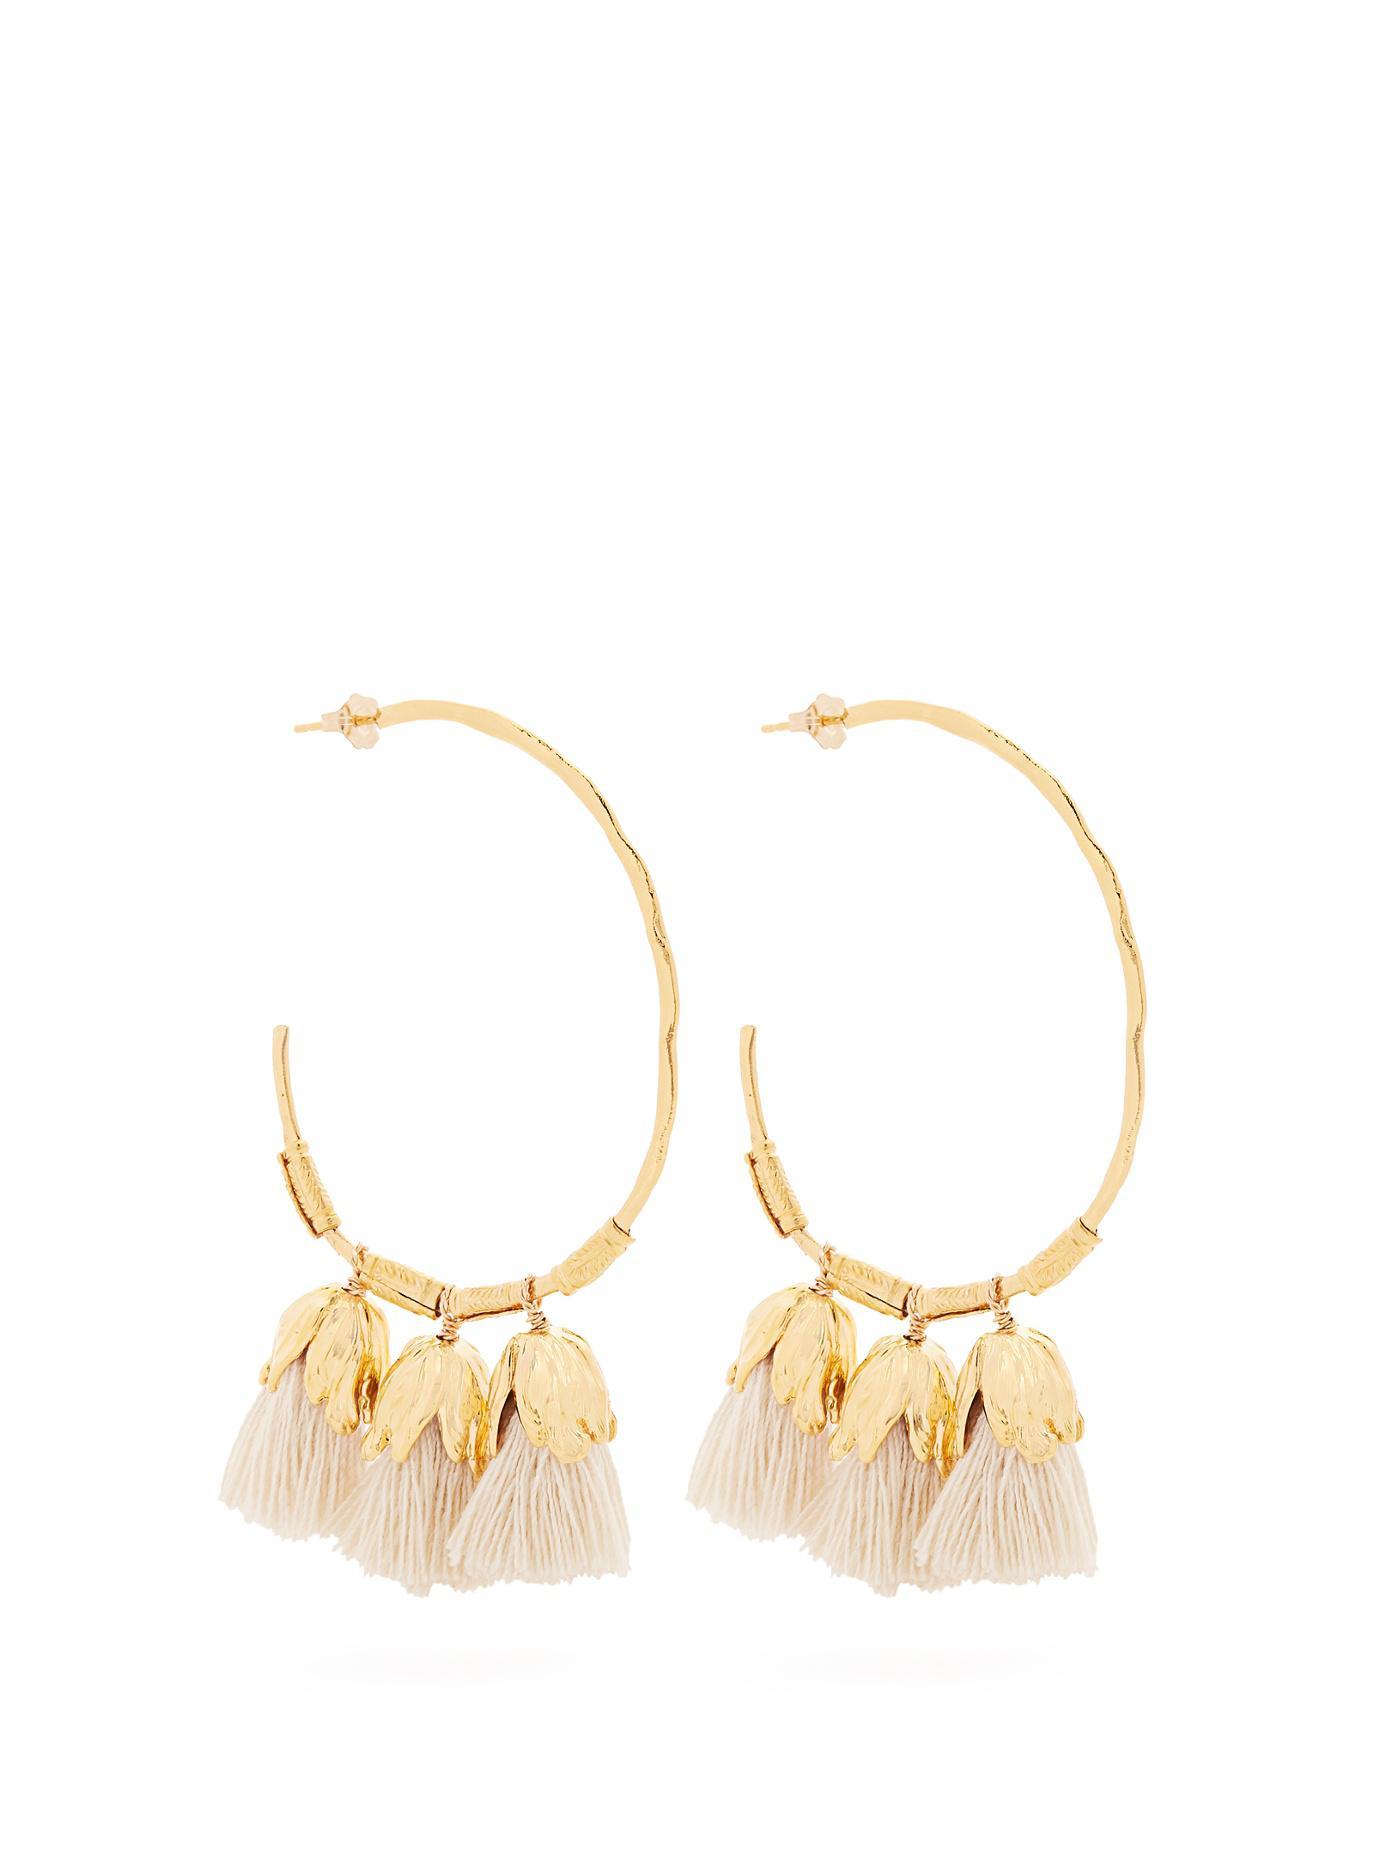 Havane tassel-drop gold-plated earrings Elise Tsikis Paris QTwdWCI